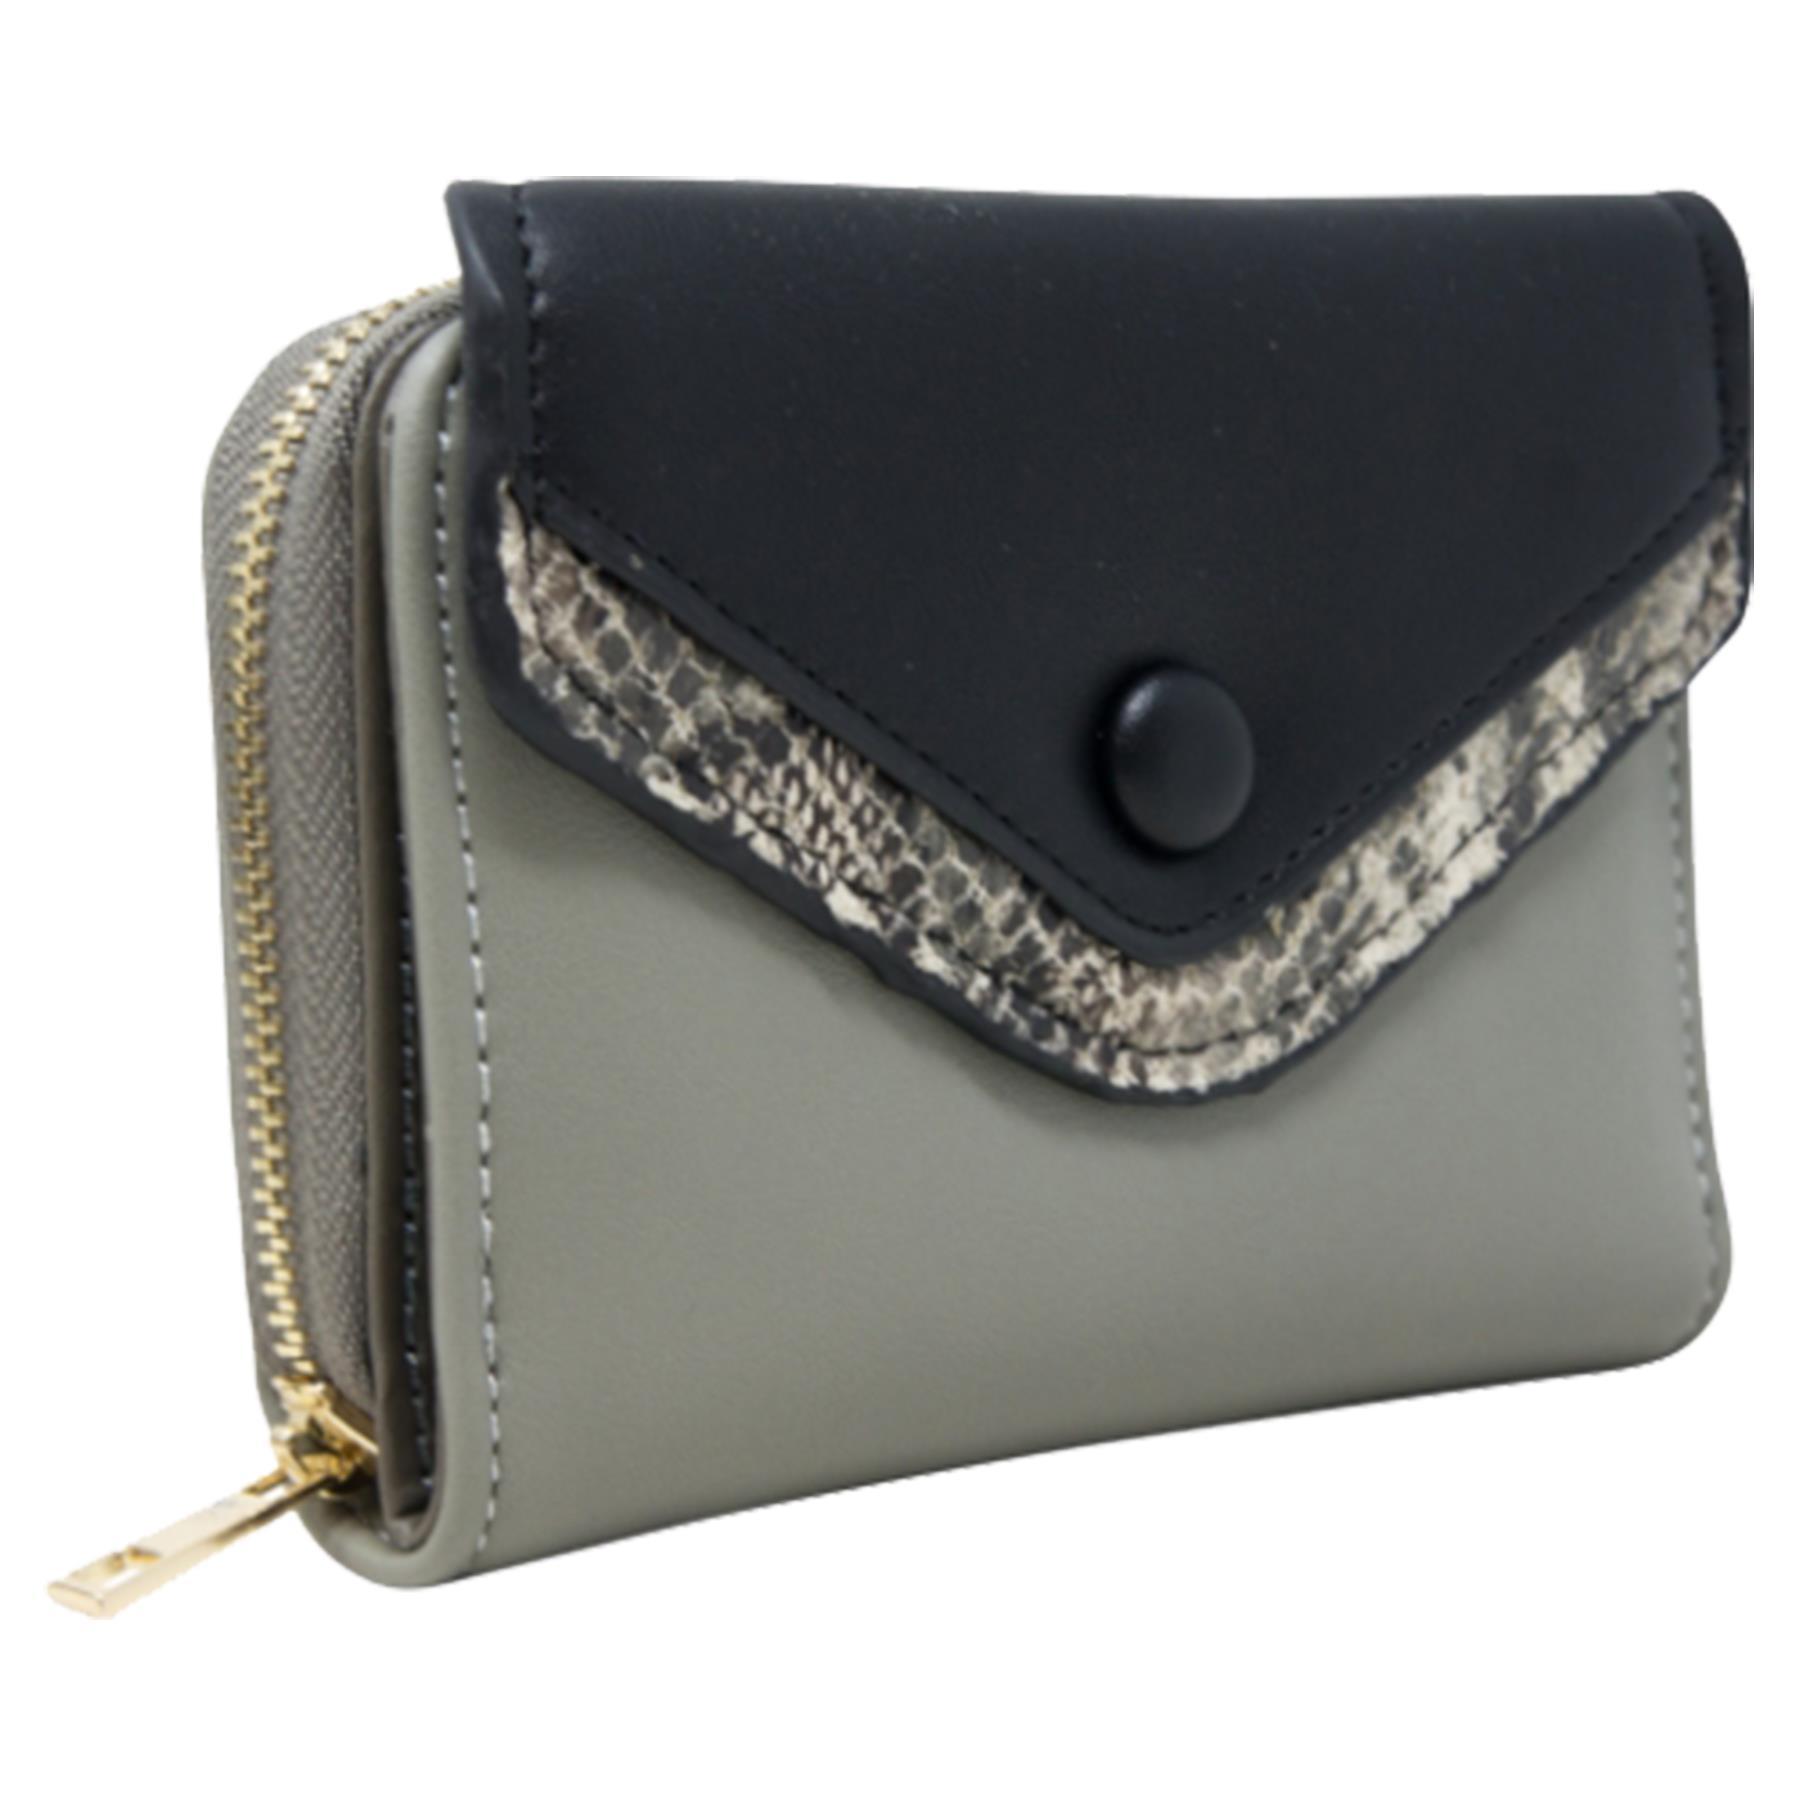 New-Ladies-Multicoloured-Envelope-Faux-Leather-Reptile-Detail-Purse thumbnail 19